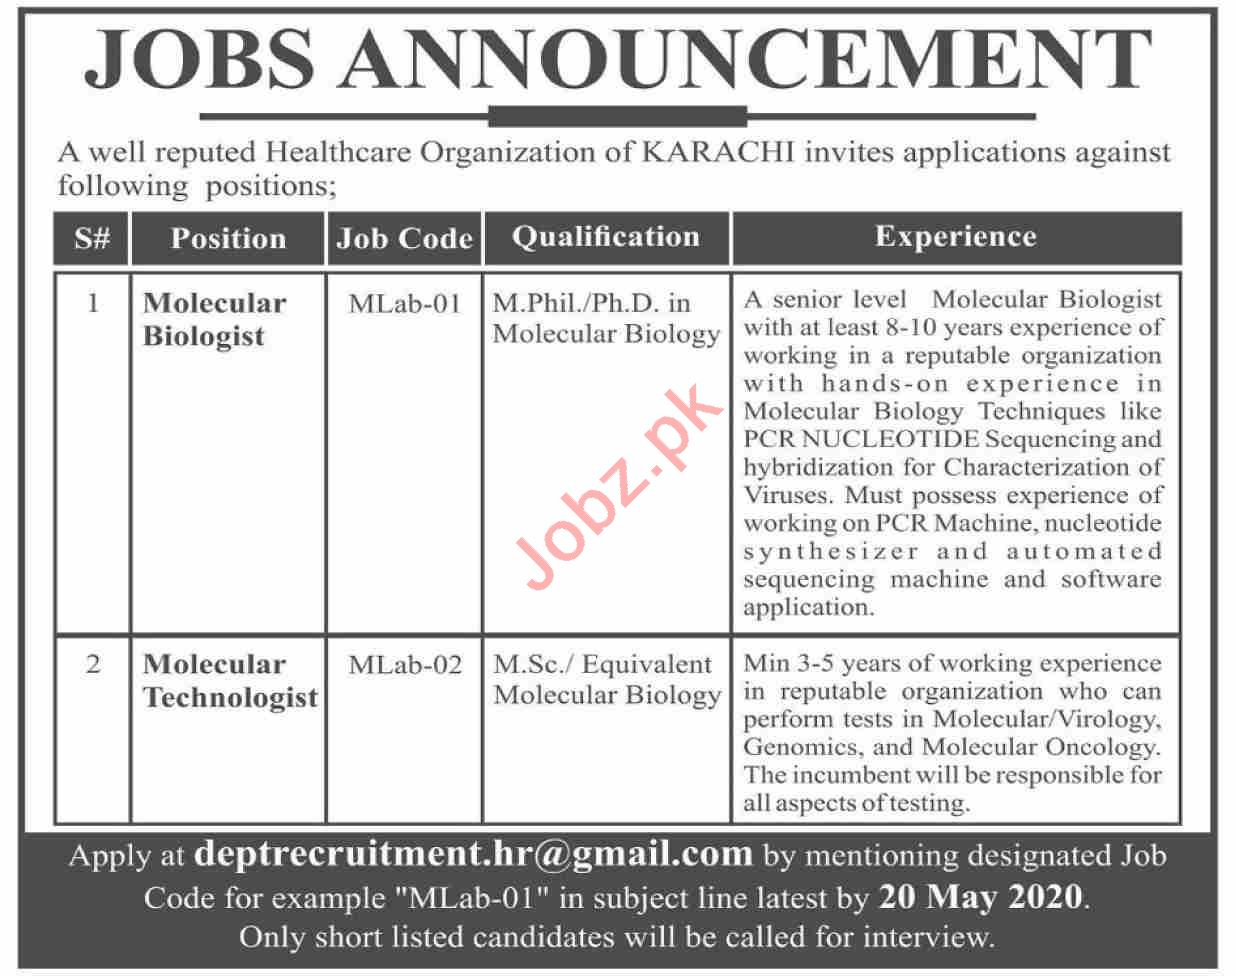 Molecular Biologist & Molecular Technologist Jobs 2020